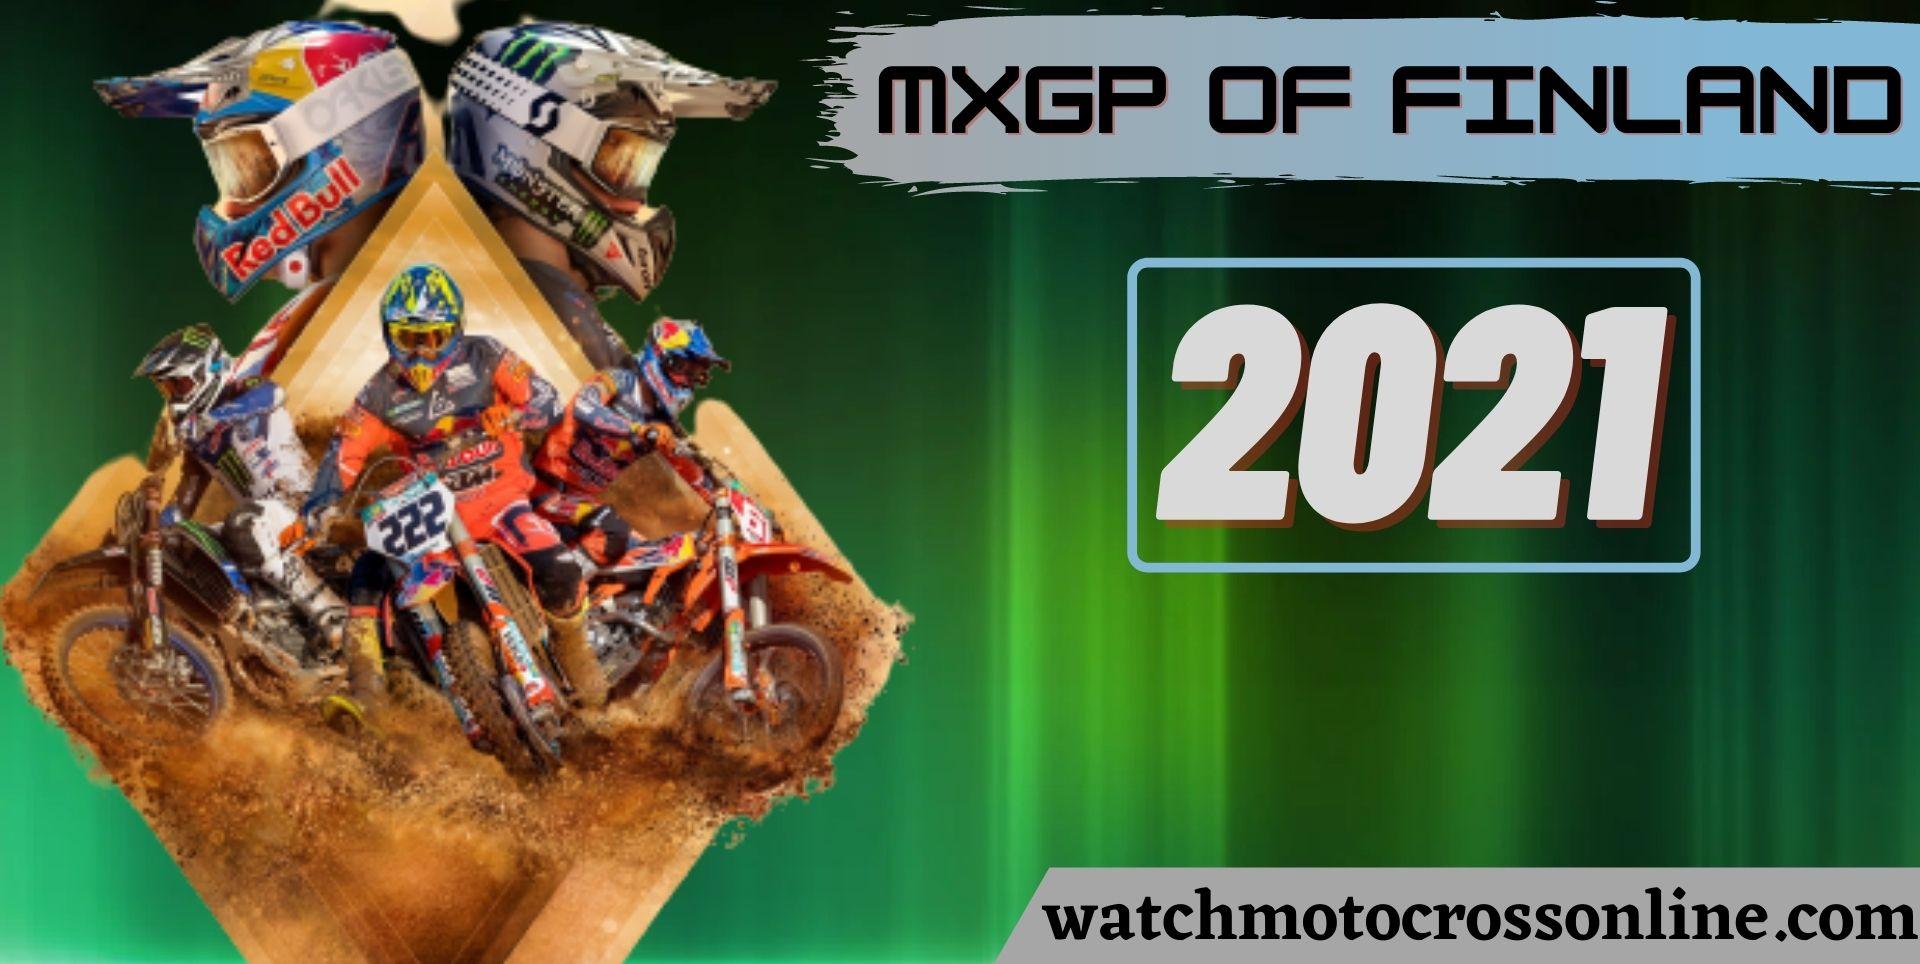 MXGP Of Finland Live Stream 2021